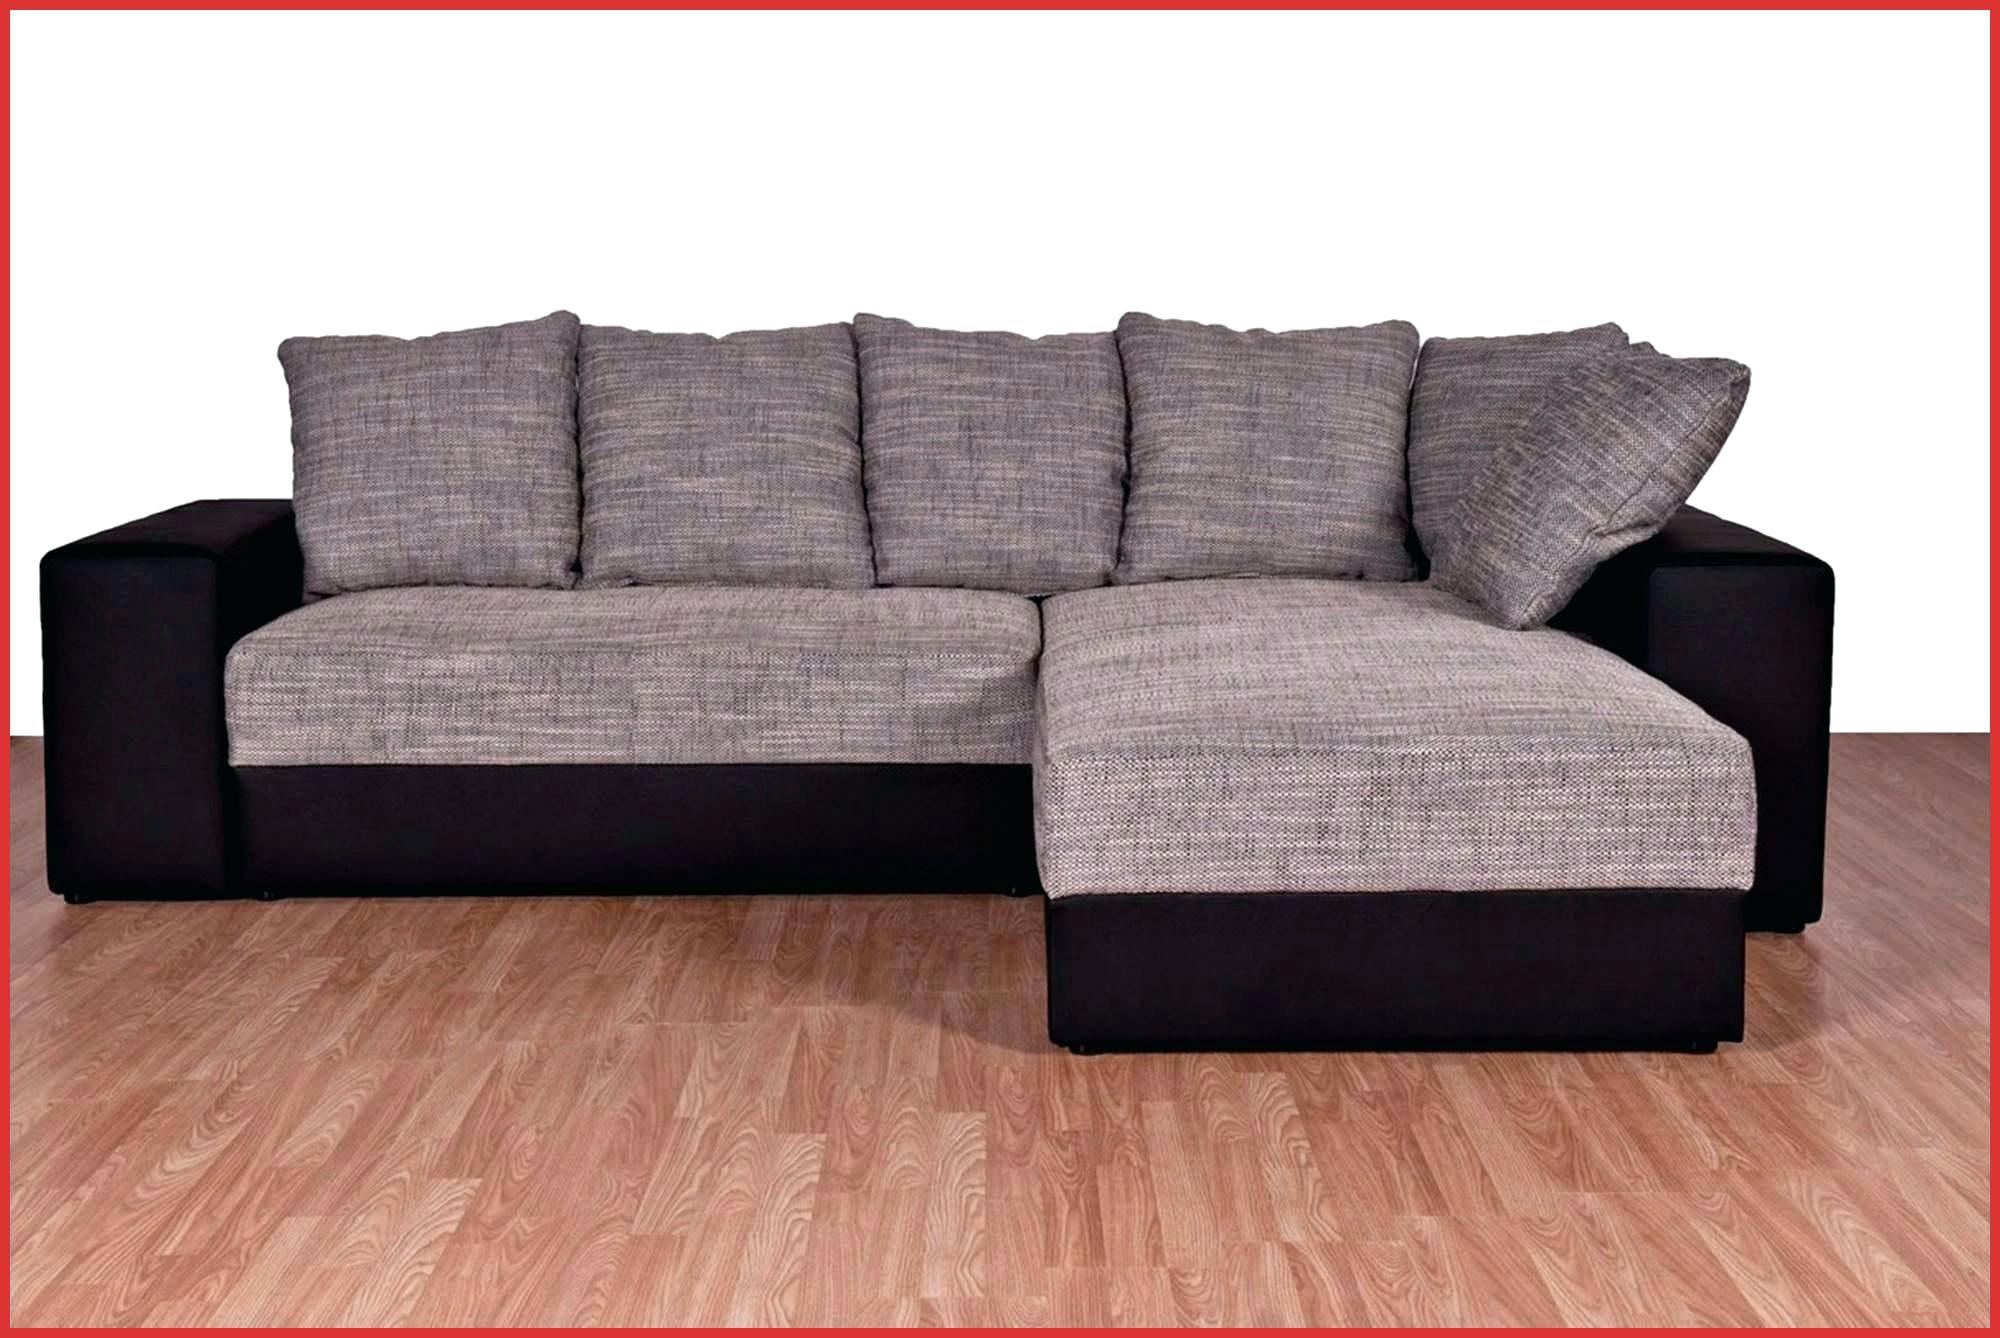 Canapé Angle Ikea Convertible Beau Photos Article with Tag Coussin Pour Meuble Exterieur